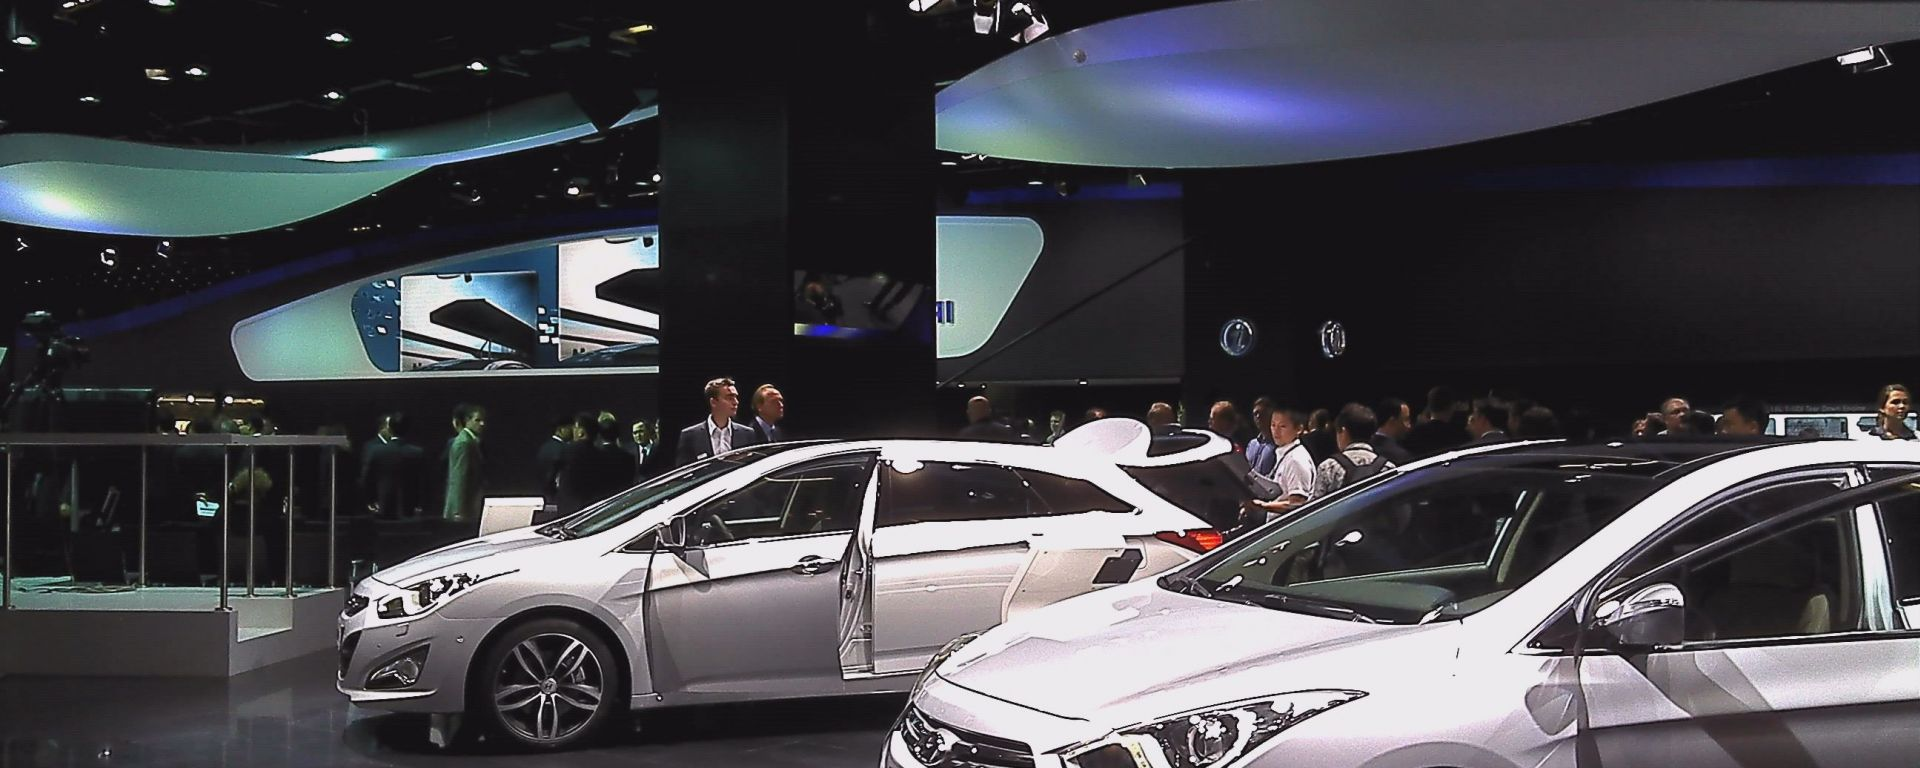 Francoforte IAA 2011: la Hyundai i30, la Veloster e la i40